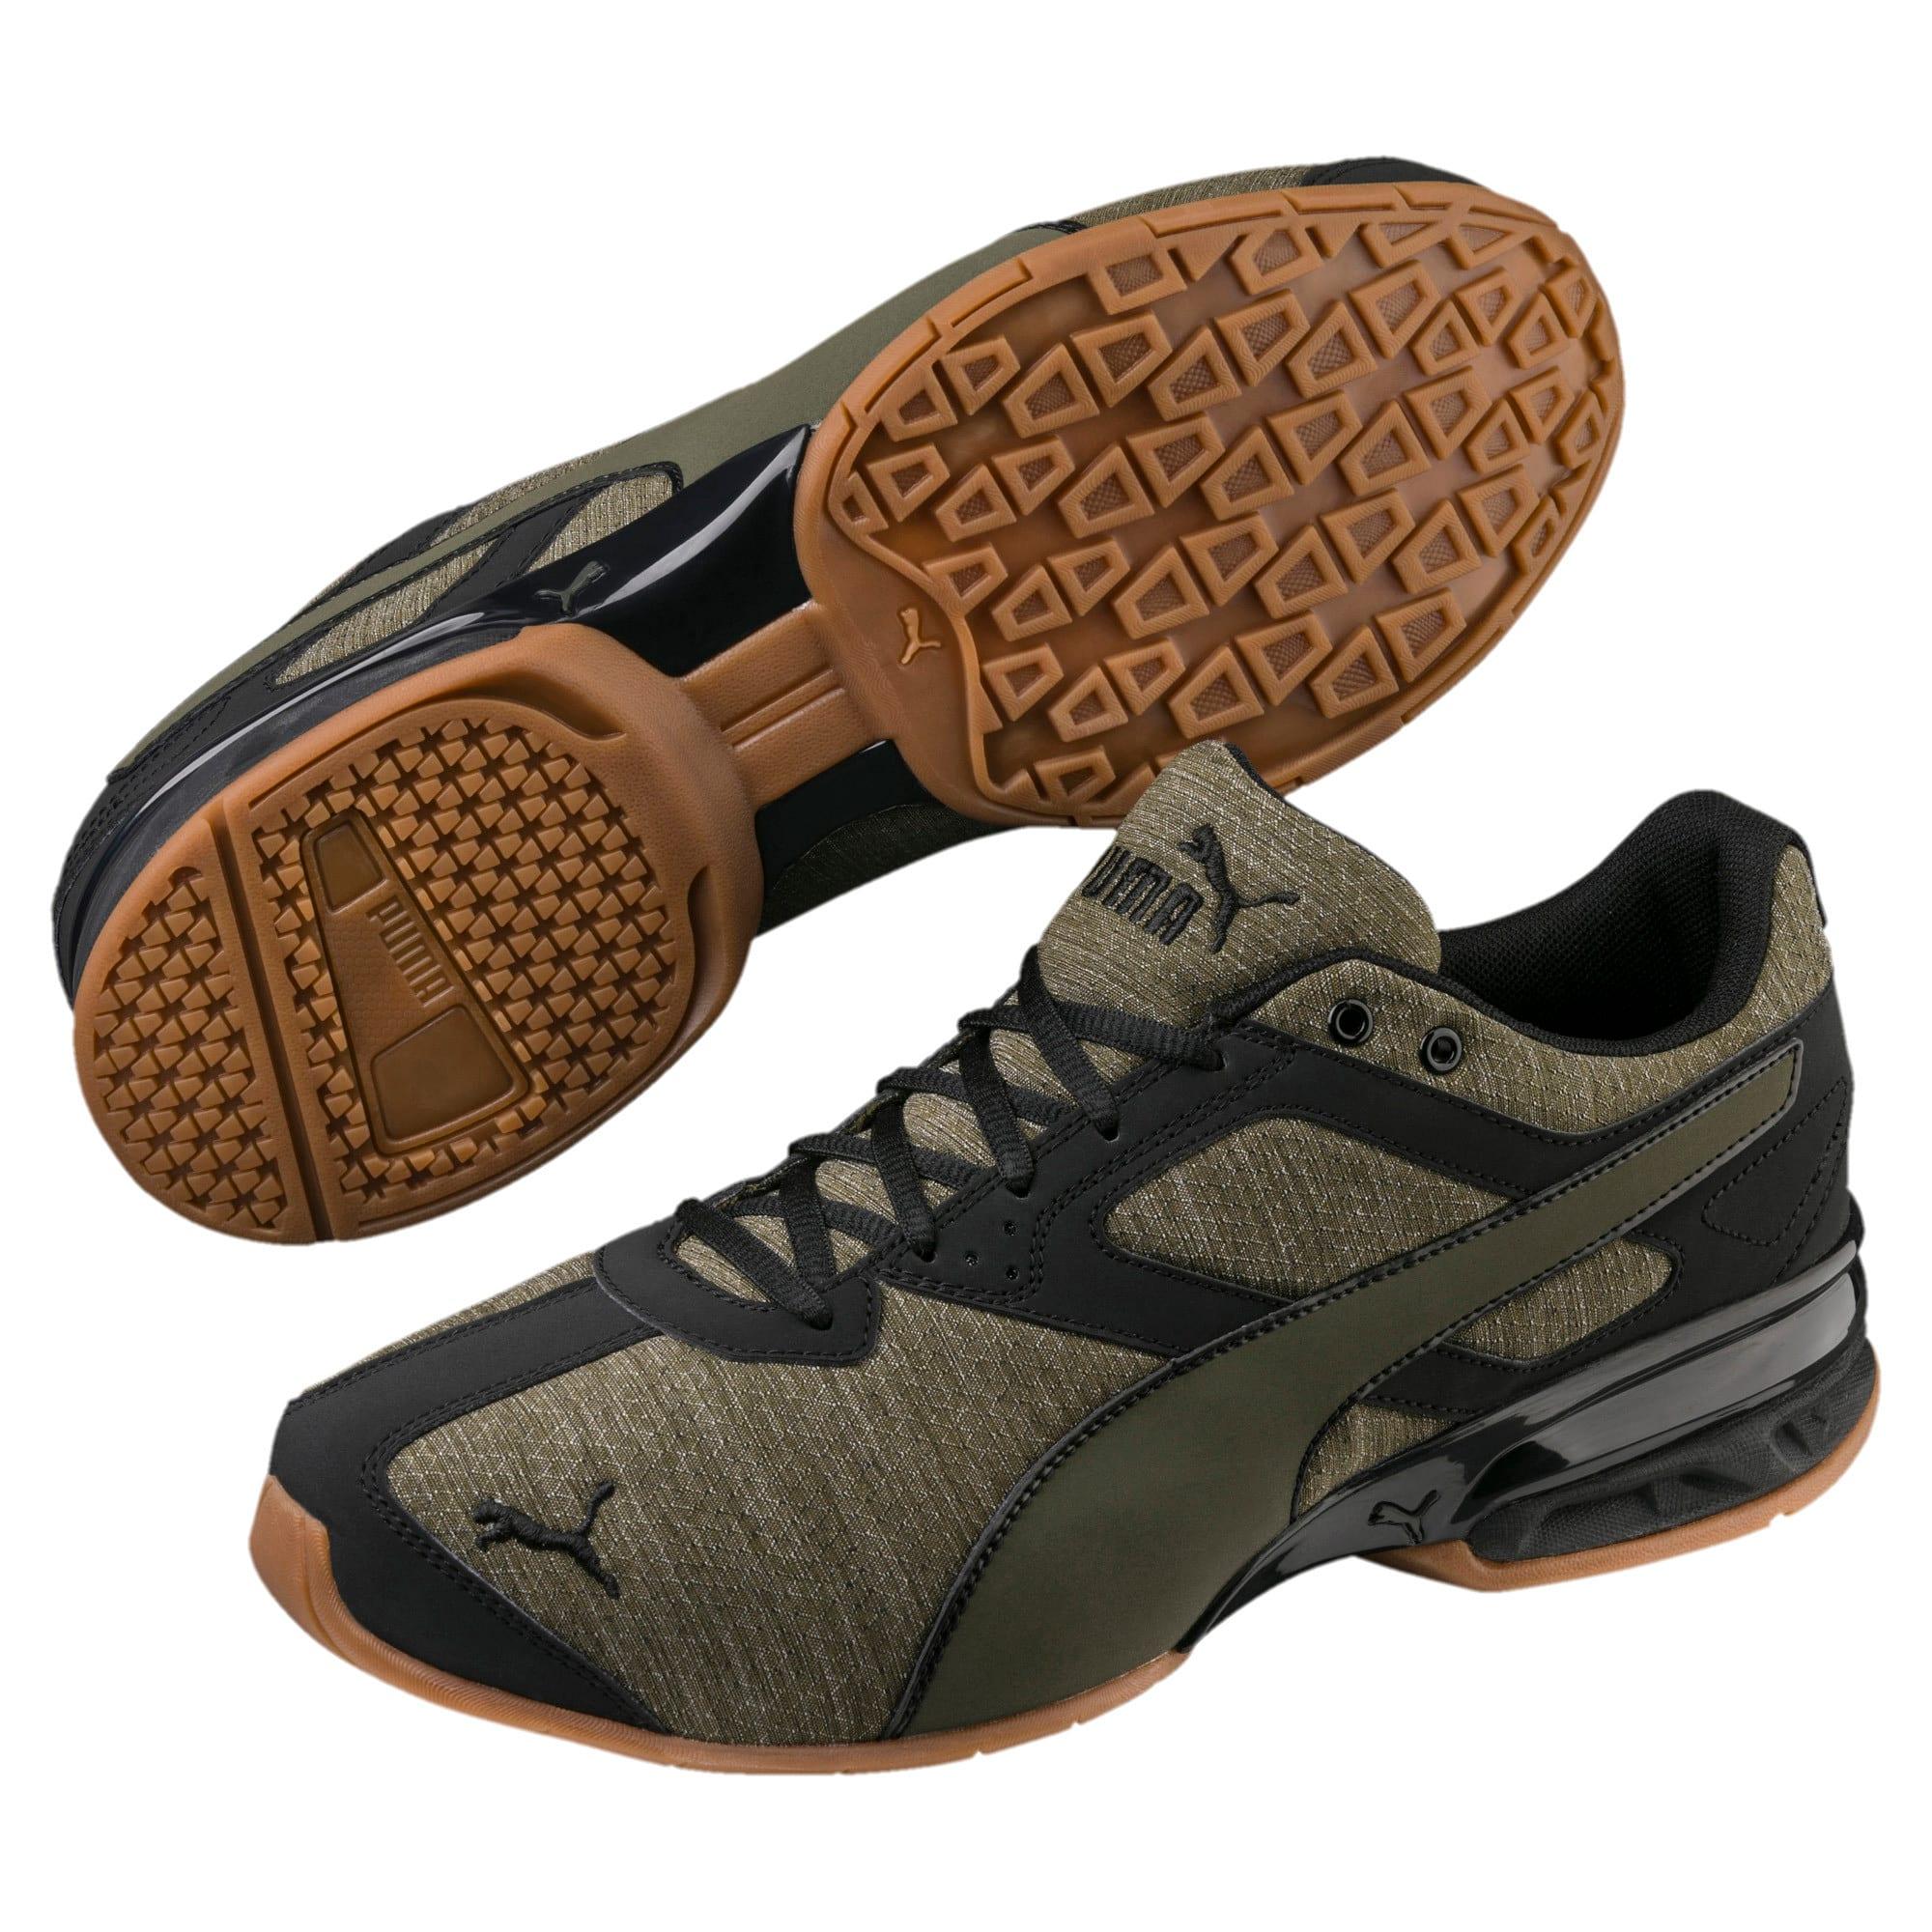 Thumbnail 1 of Tazon 6 Heather Rip Men's Sneakers, Forest Night-Puma Black, medium